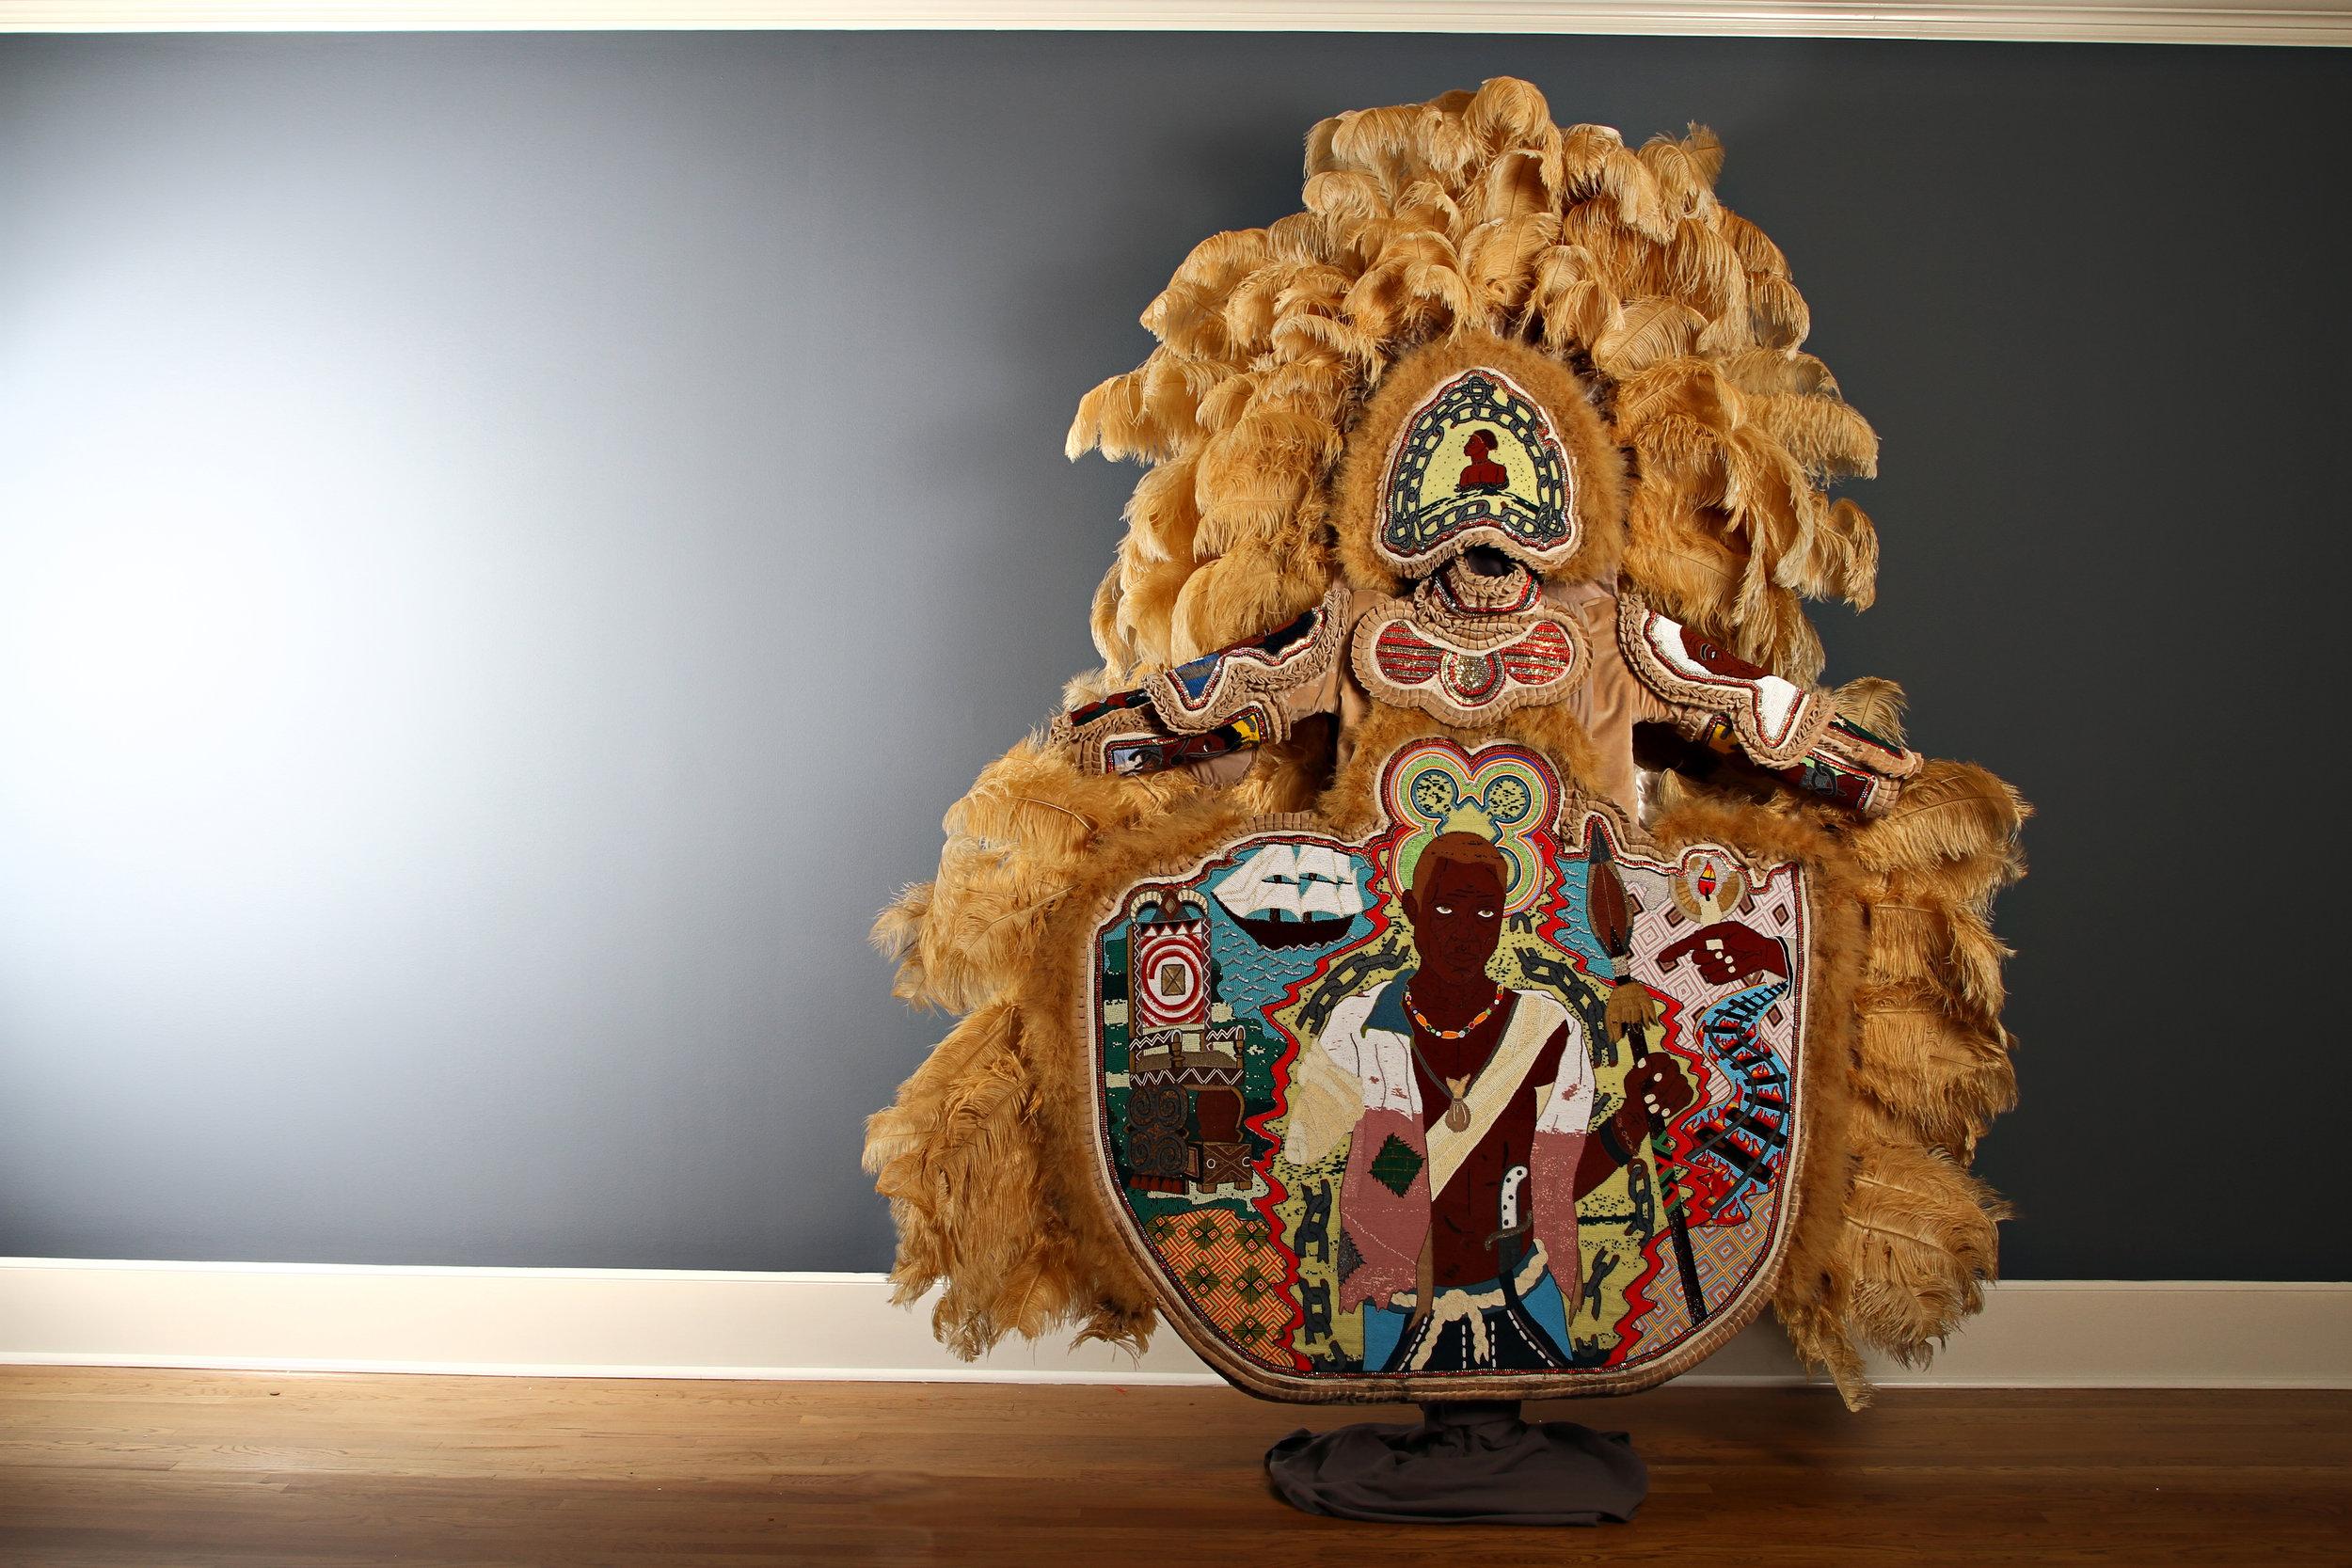 Contemporary Artist Demond Melancon